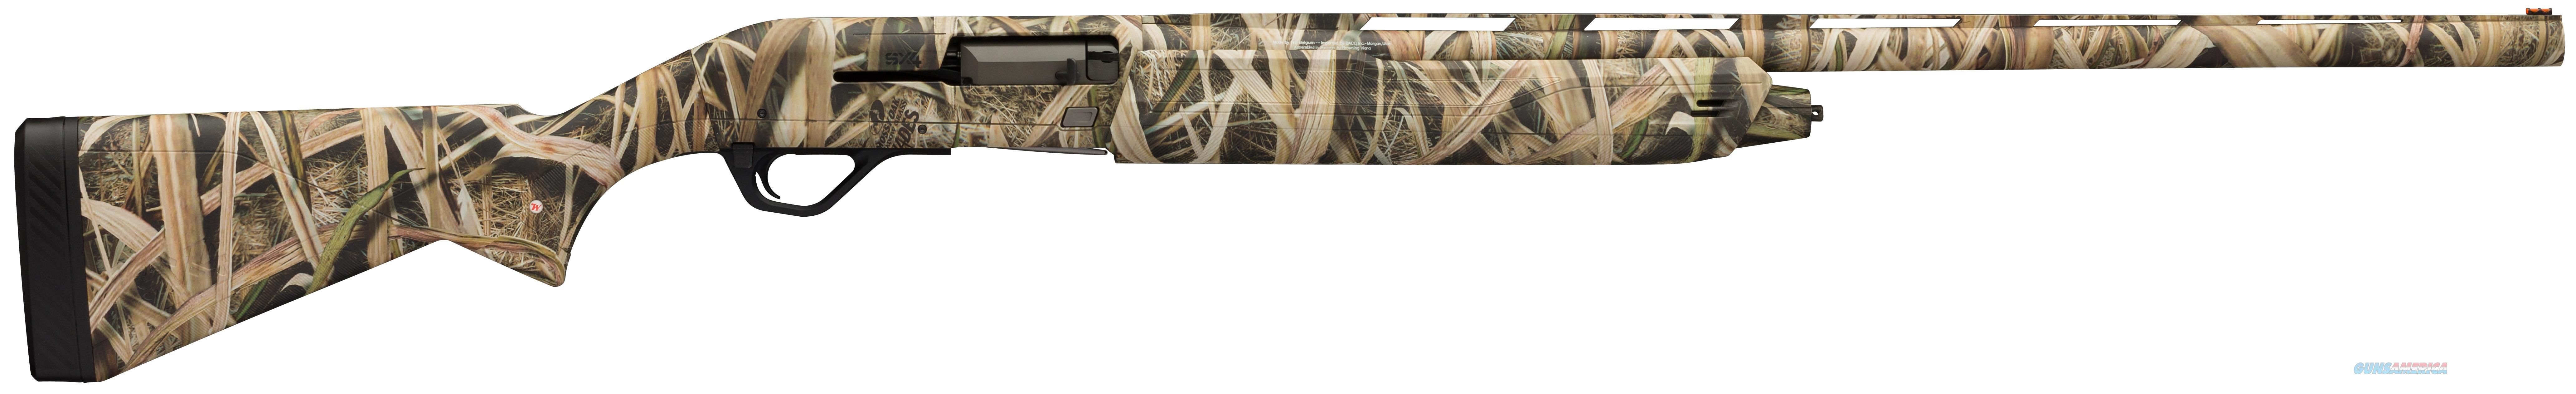 SX4 Waterfowl Hunter MOSGB 20Ga 26-3In  511206691  Guns > Shotguns > Winchester Shotguns - Modern > Autoloaders > Hunting